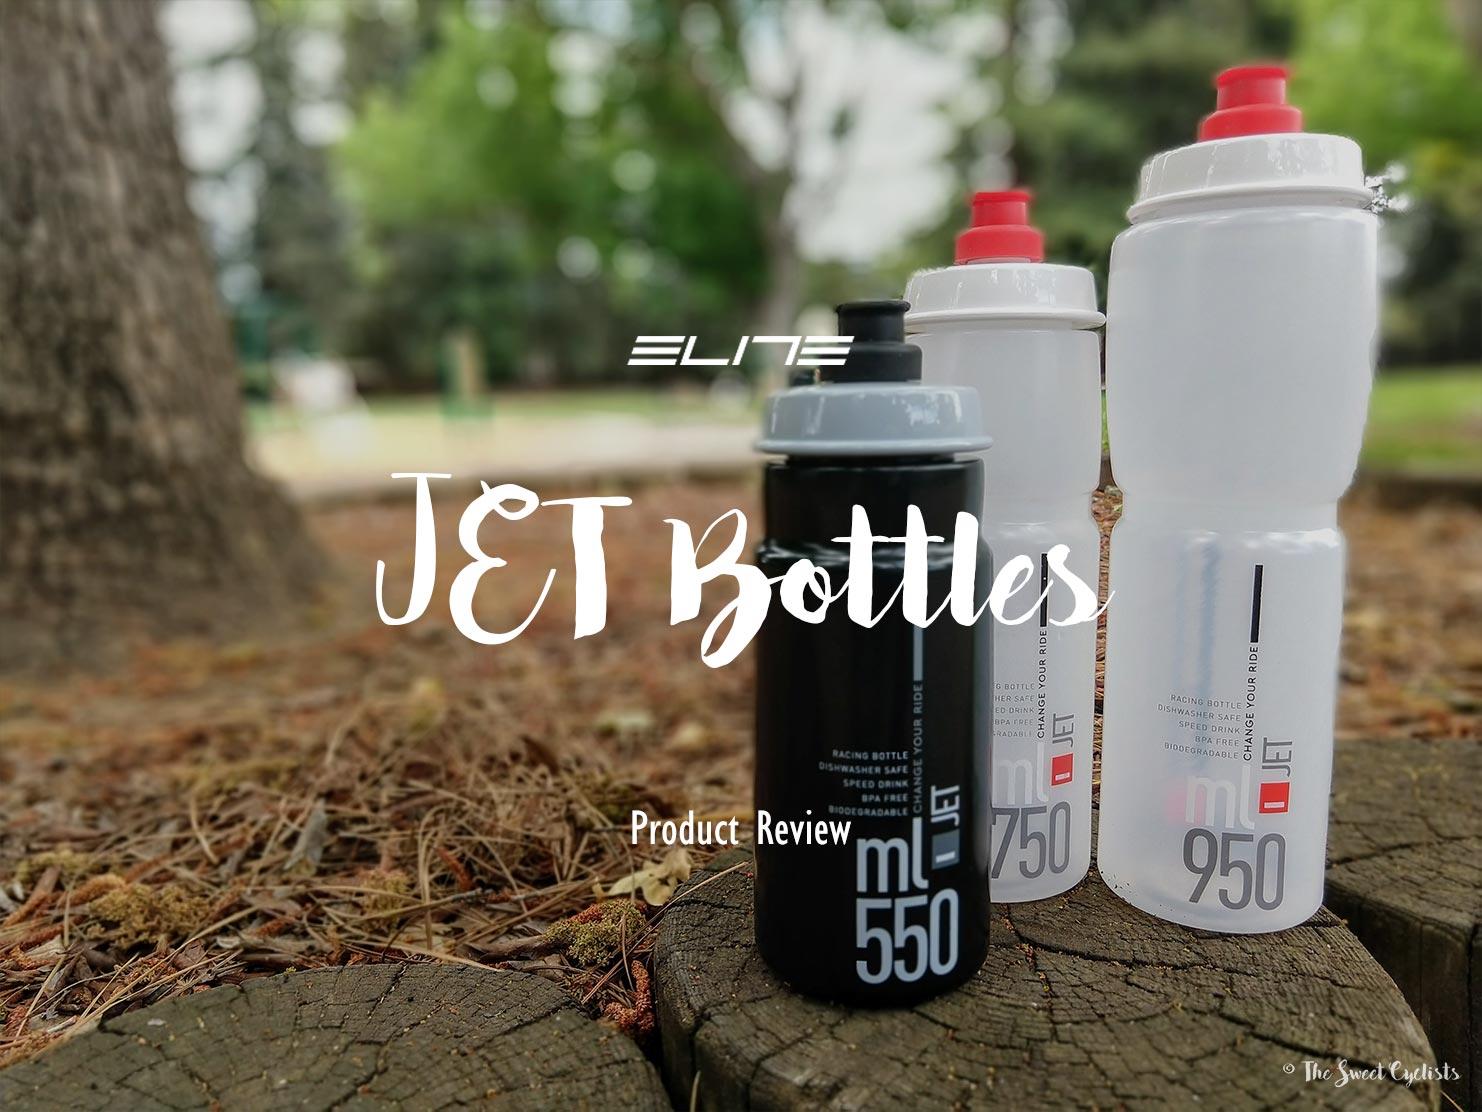 Elite Jet – Finally a Biodegradable Bike Water Bottle!